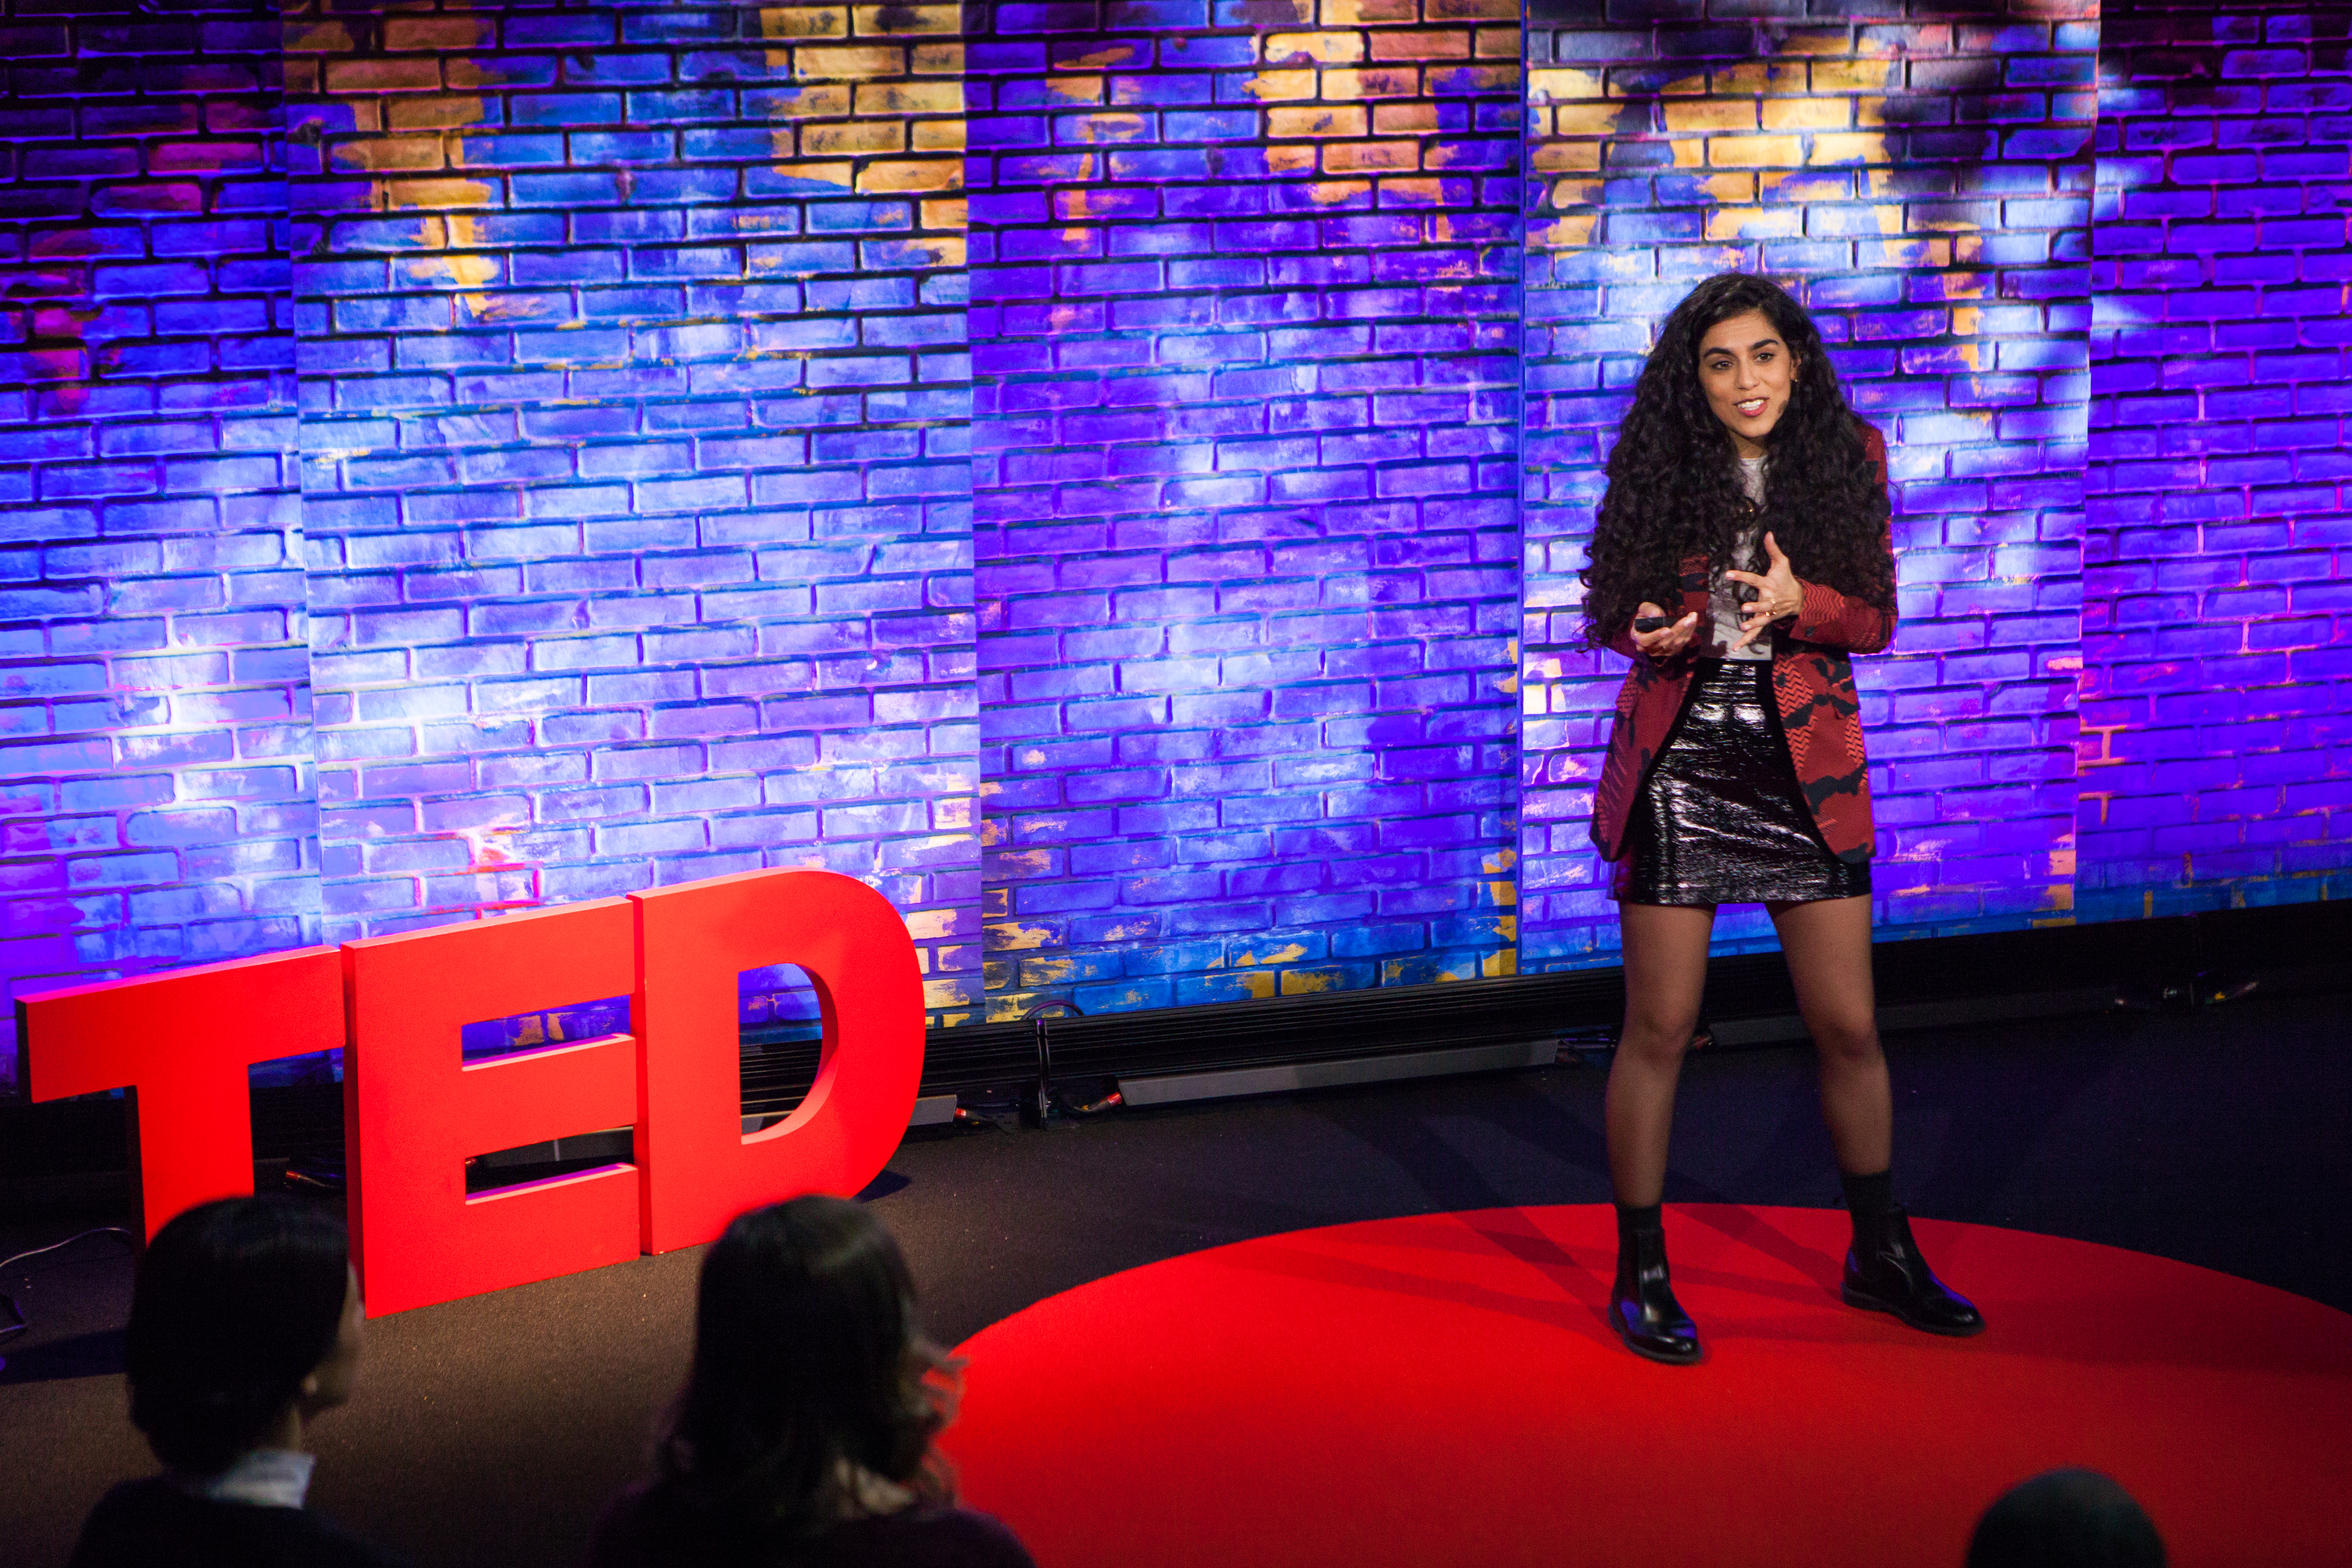 Mona Chalabi speaks at TEDNYC - Rebirth, February 15, 2017, New York, NY. (Photo: Jasmina Tomic / TED)